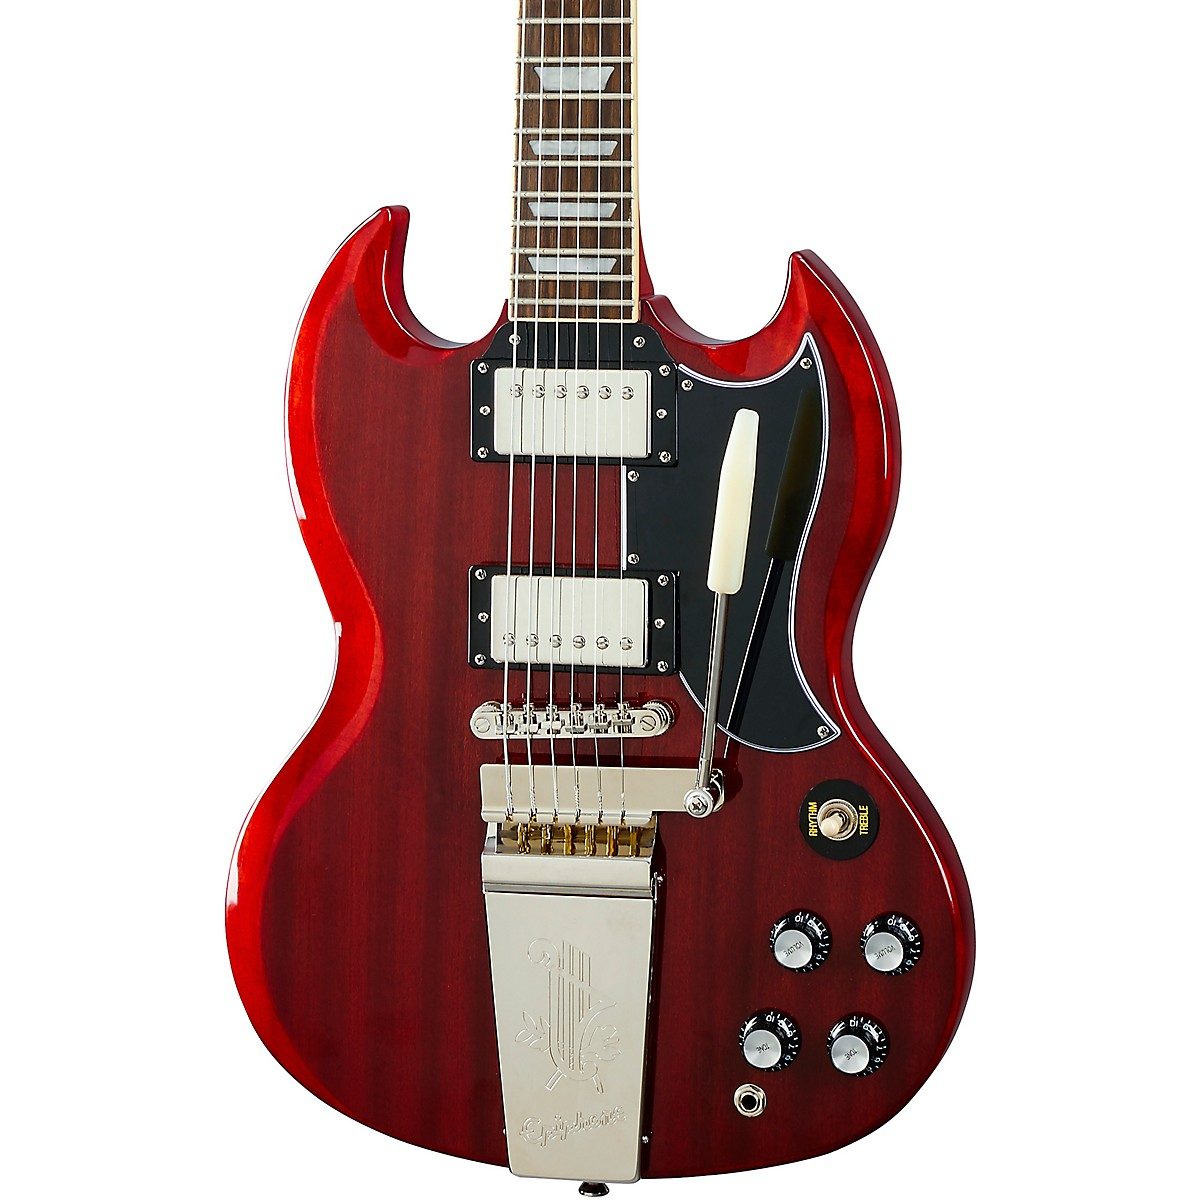 Epiphone SG Standard '61 Maestro Vibrola Electric Guitar